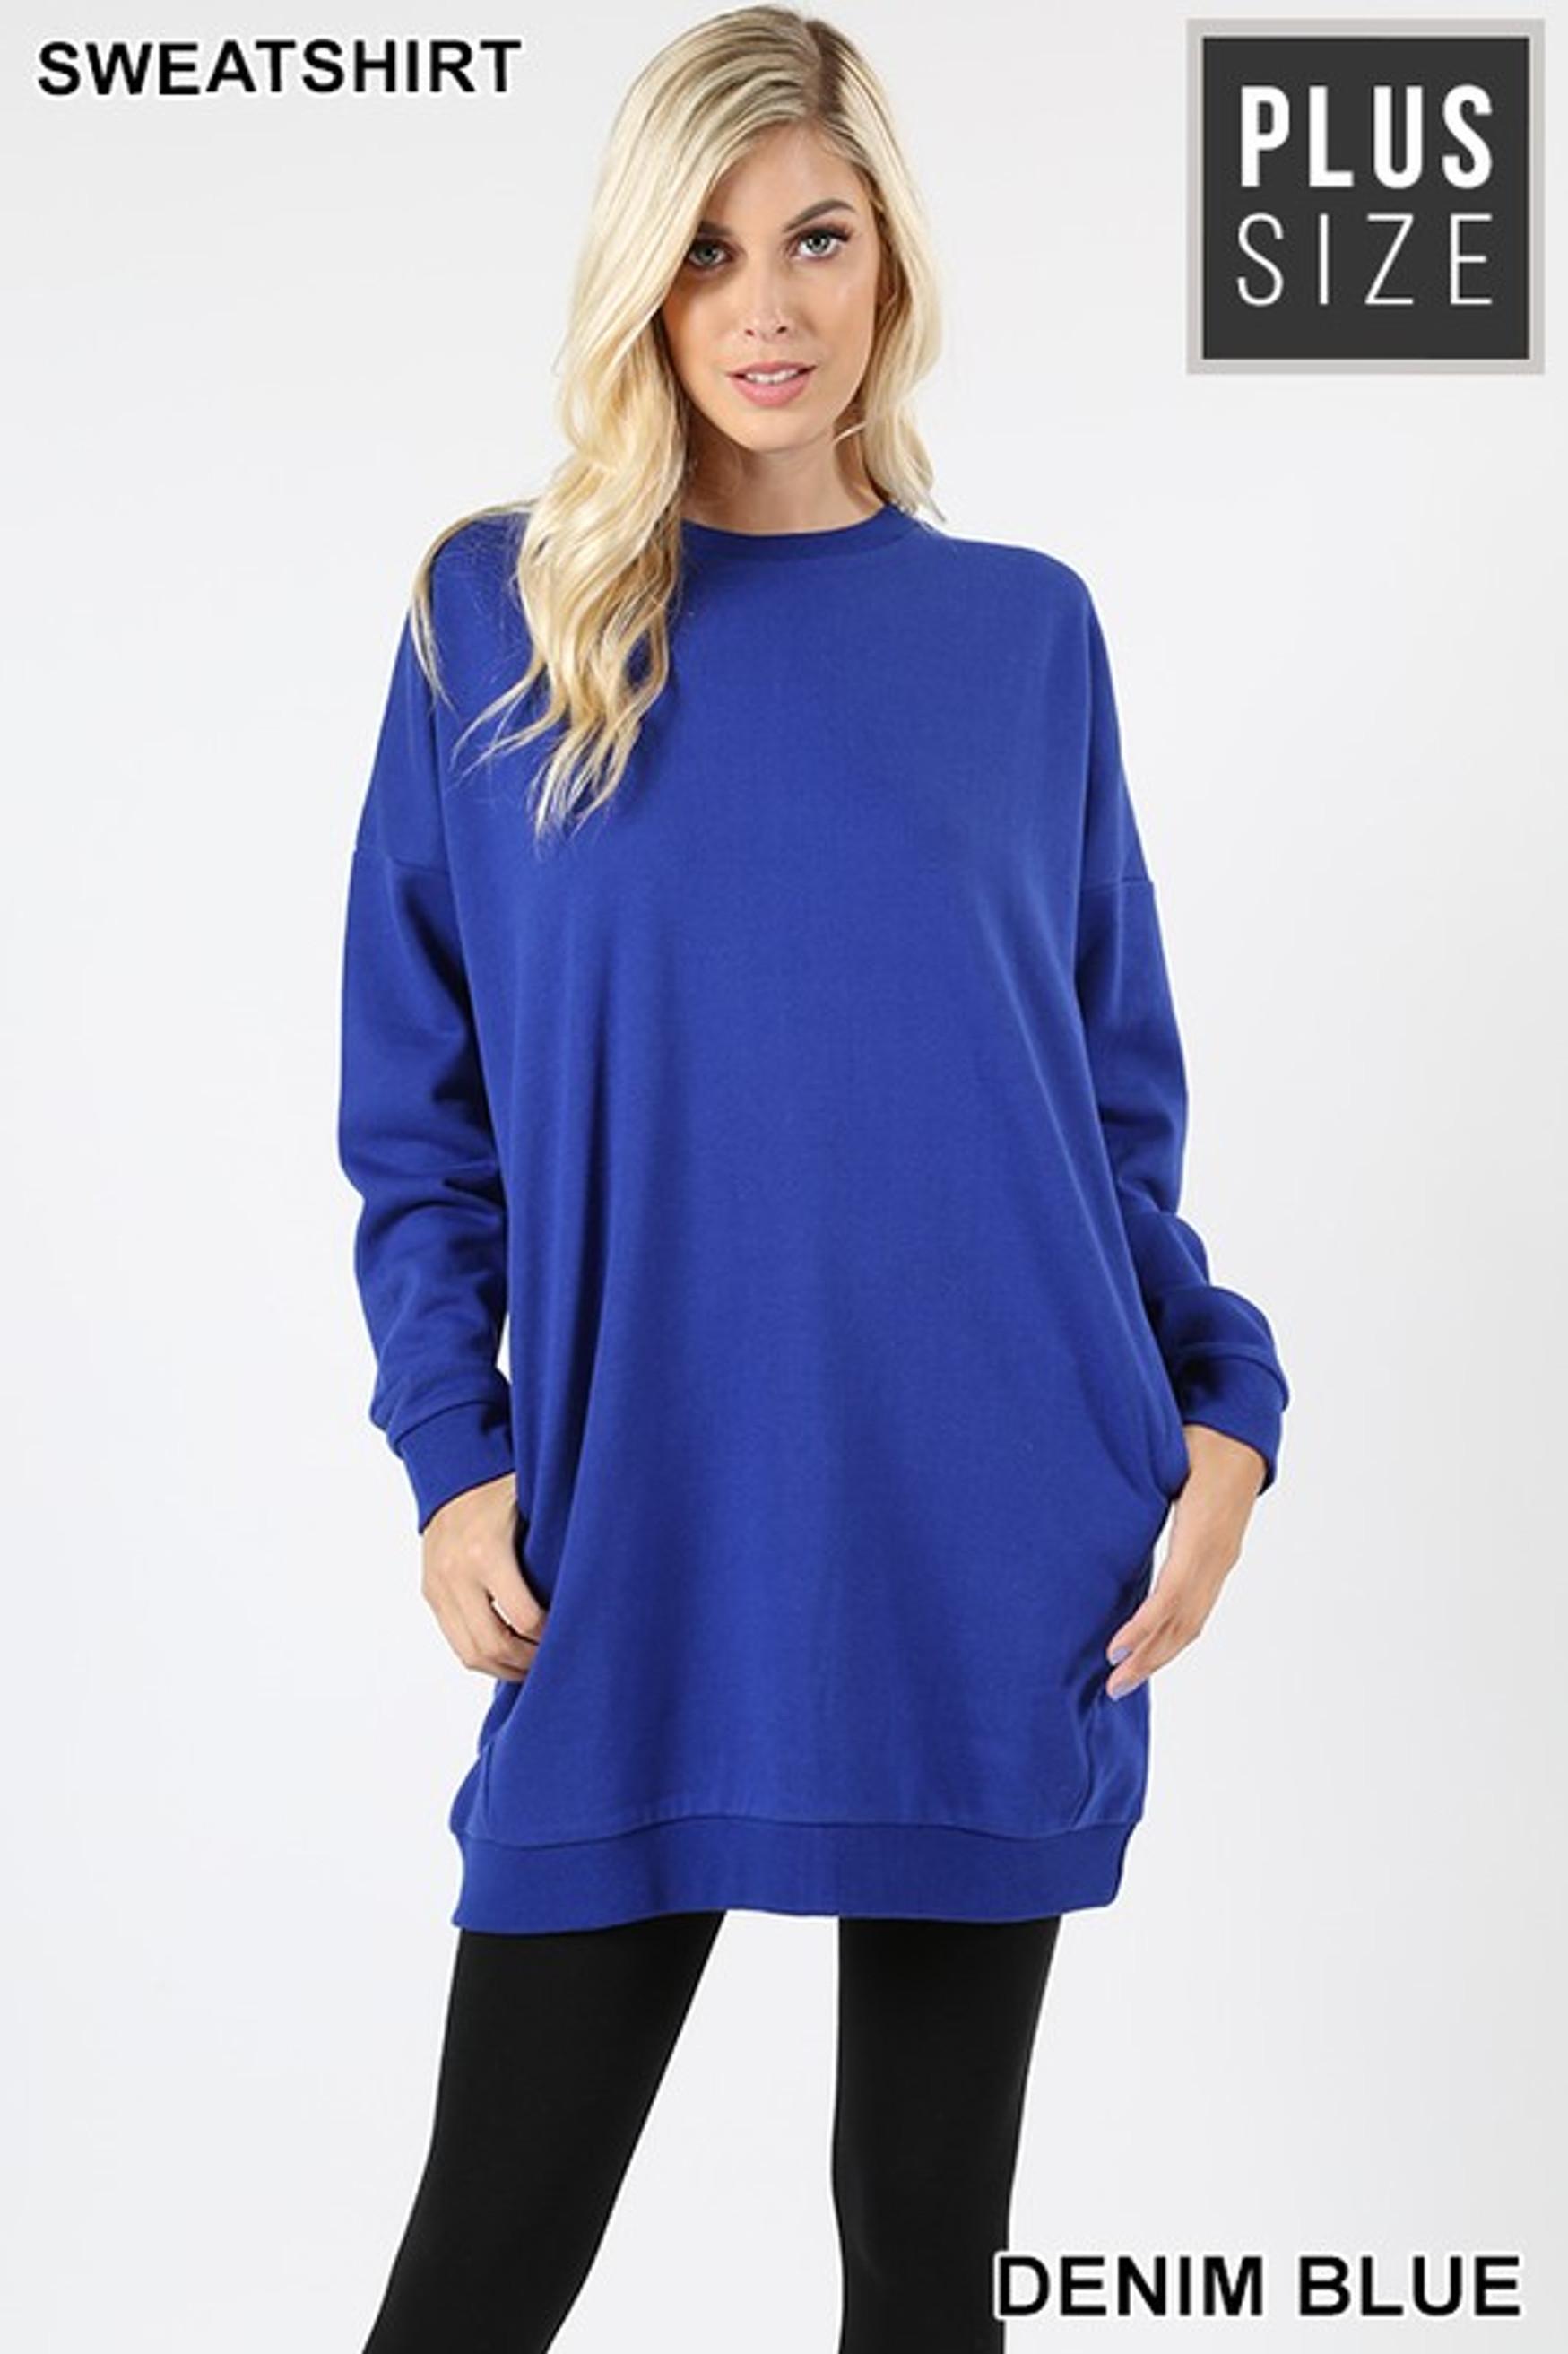 Premium Oversized Round-Neck Plus Size Sweatshirt with Pockets